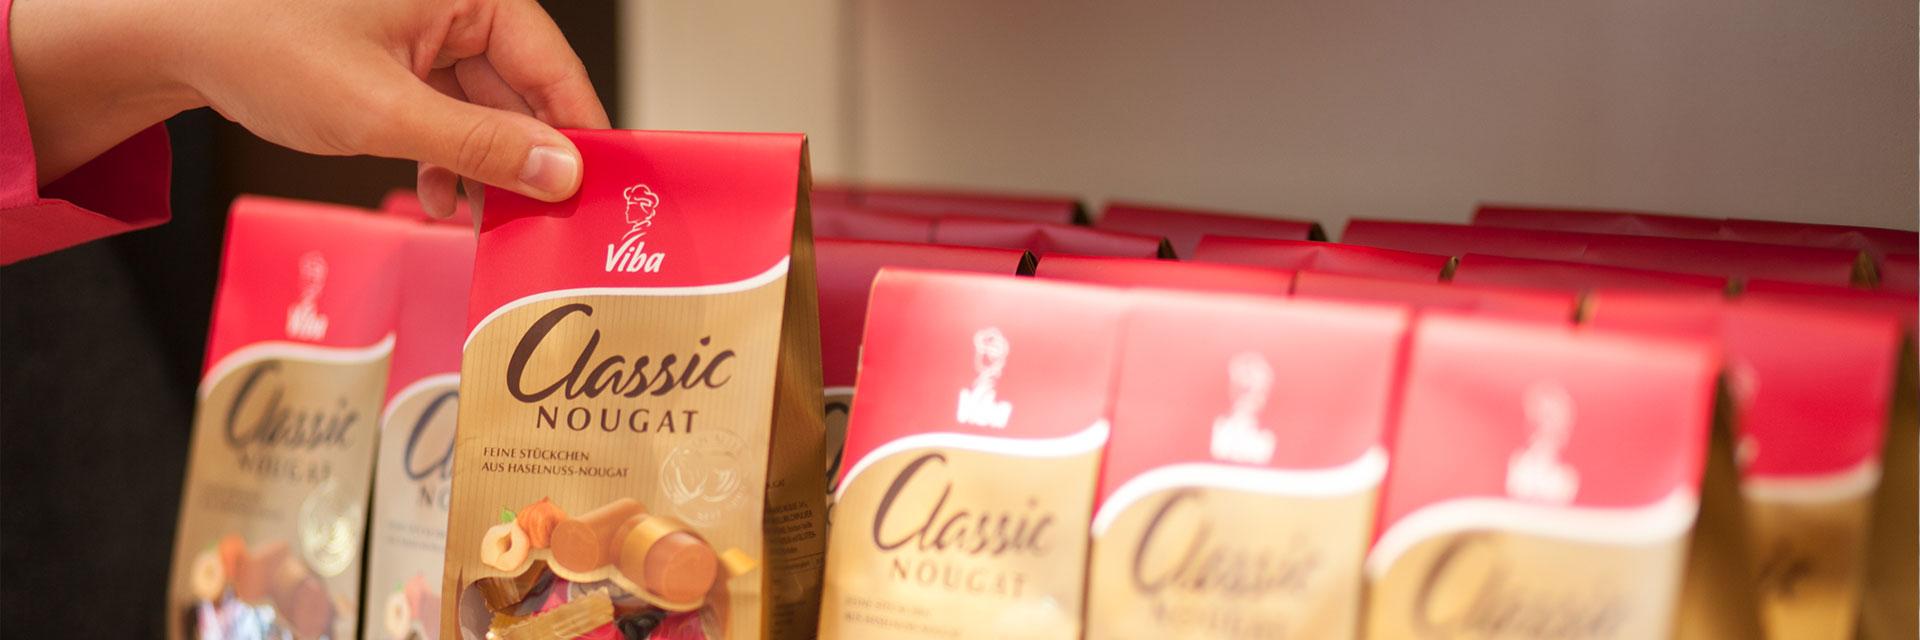 Unsere Confiserie Erfurt bietet Classic Beutel im Regal an.